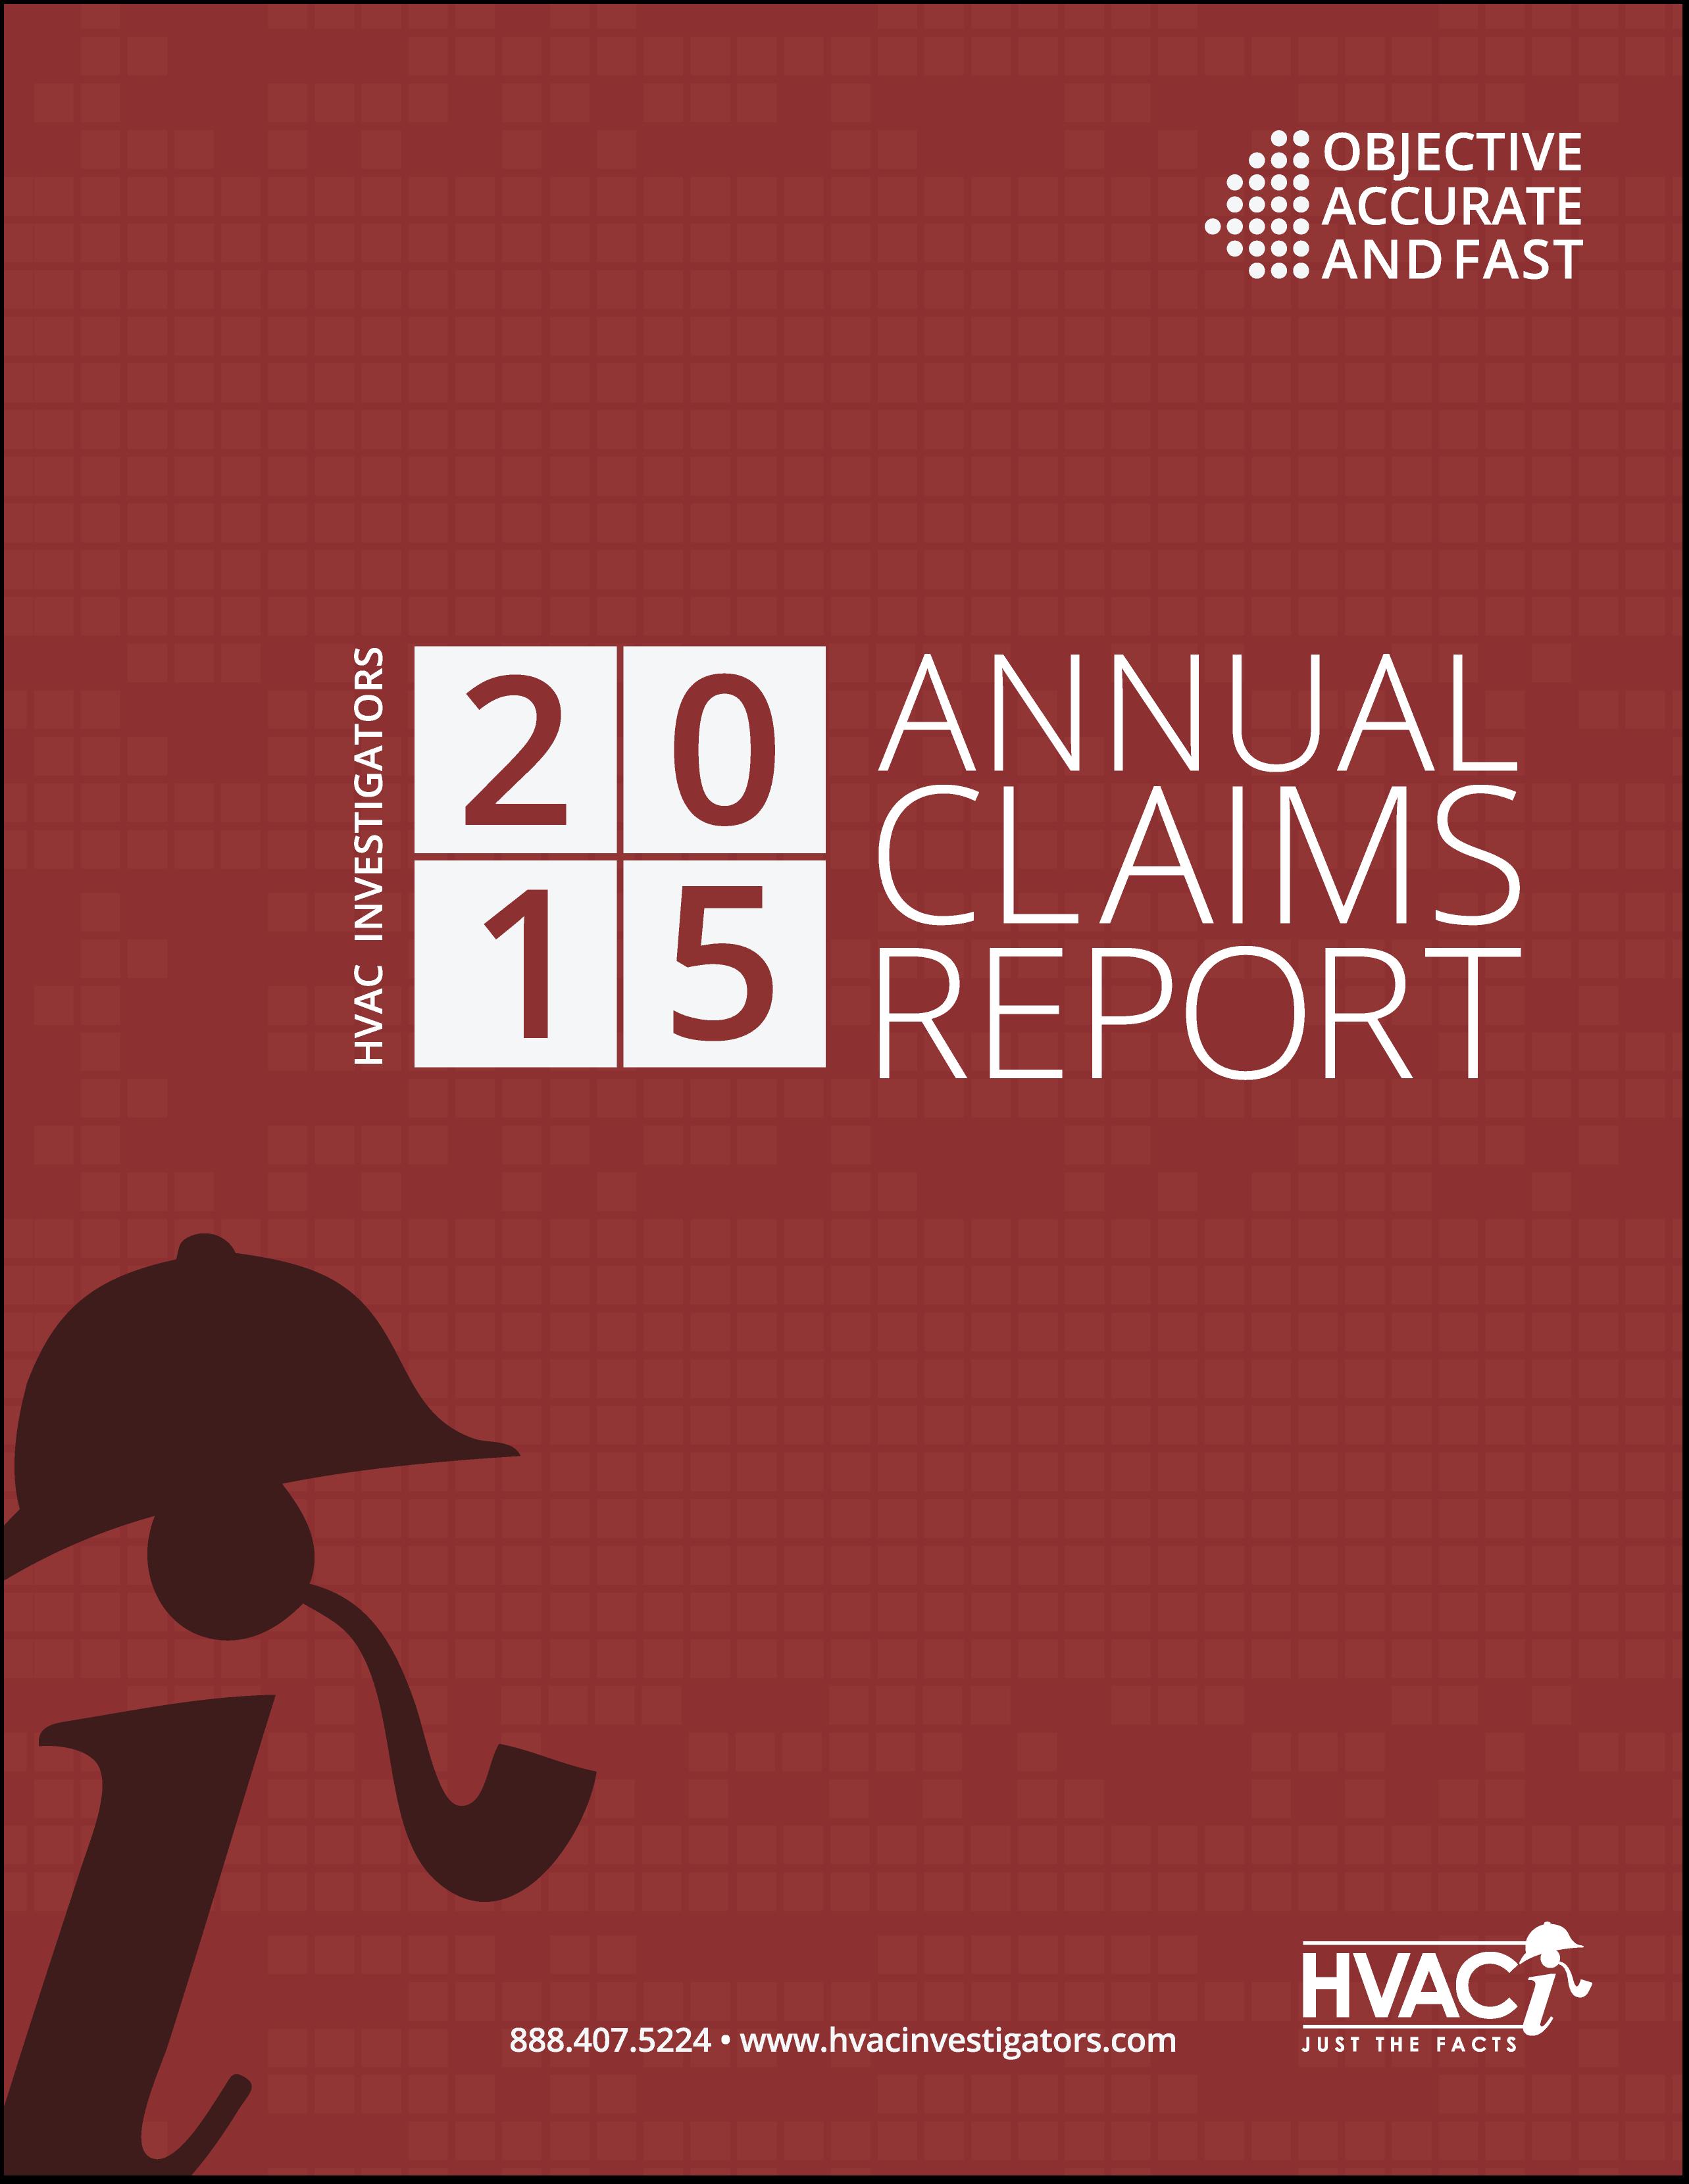 HVACi 2015 Annual Claims Report